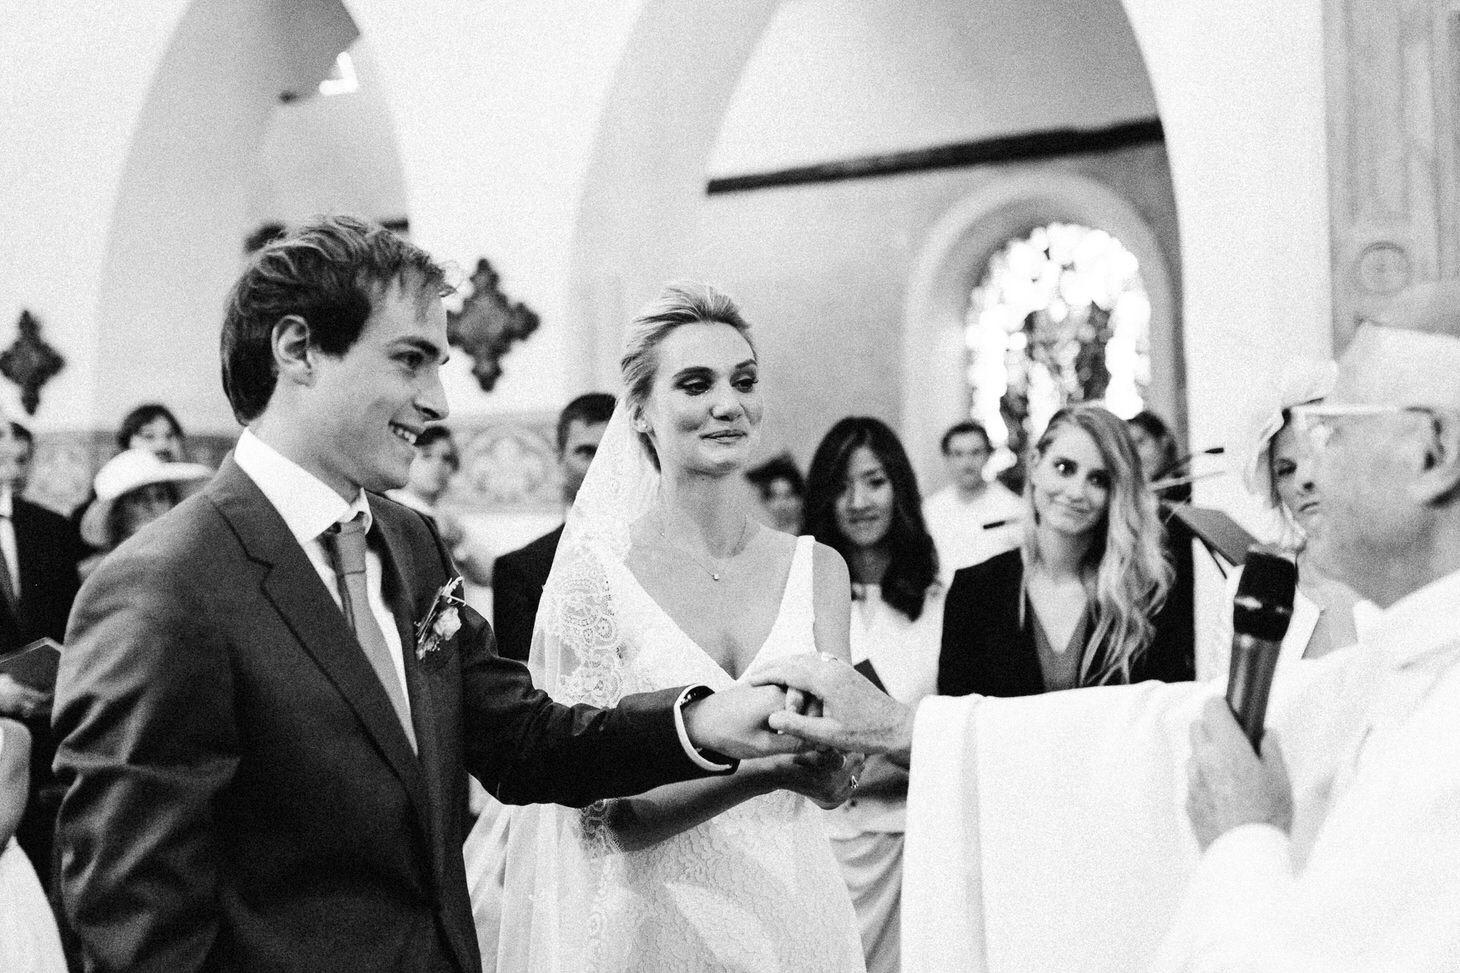 photographe-mariage-paris-montfort-l-amaury-032